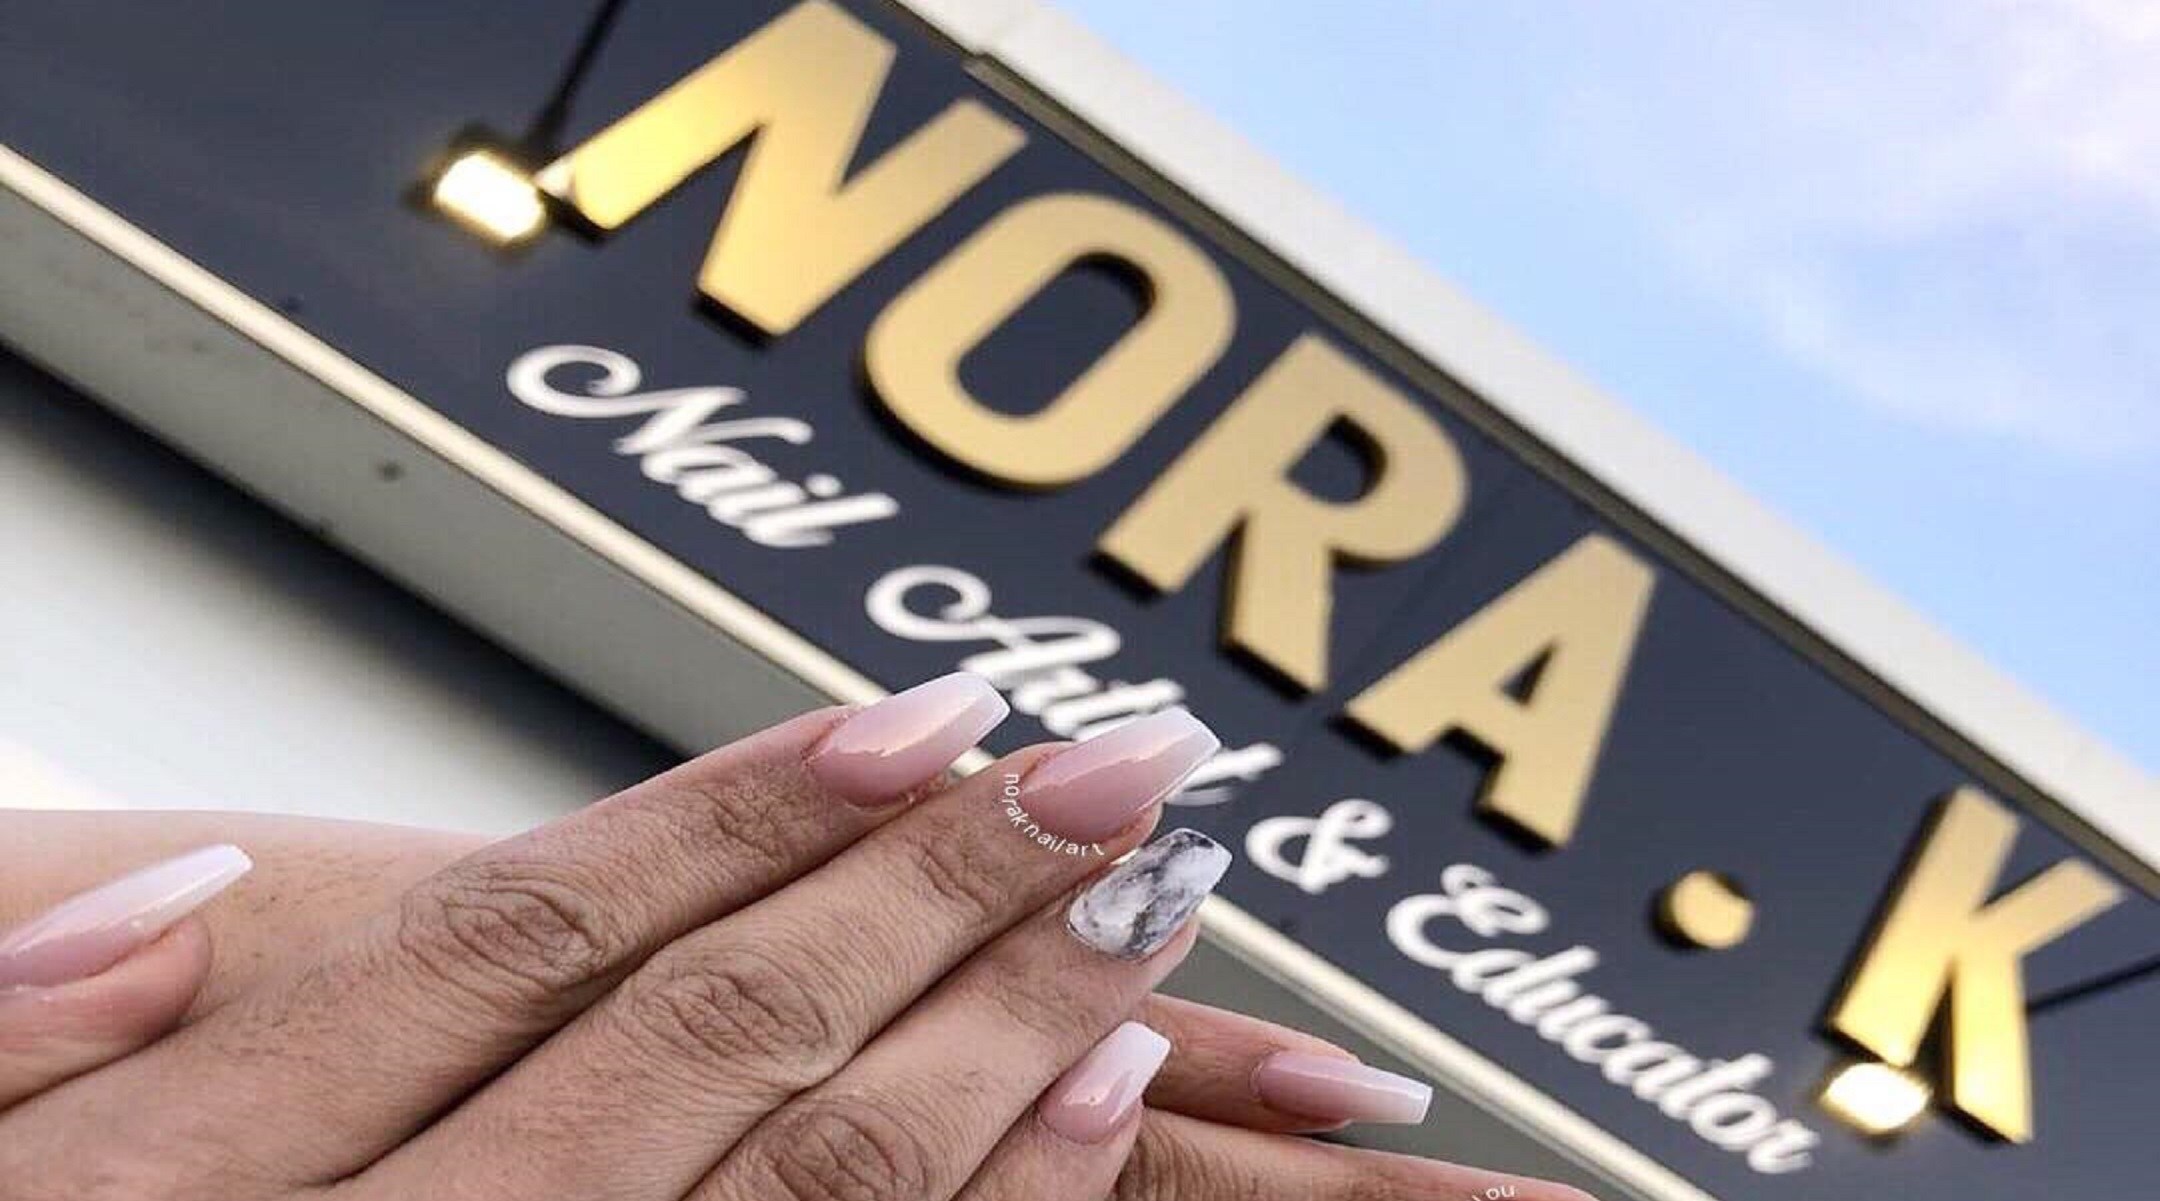 Nora.k nail artist & éducator